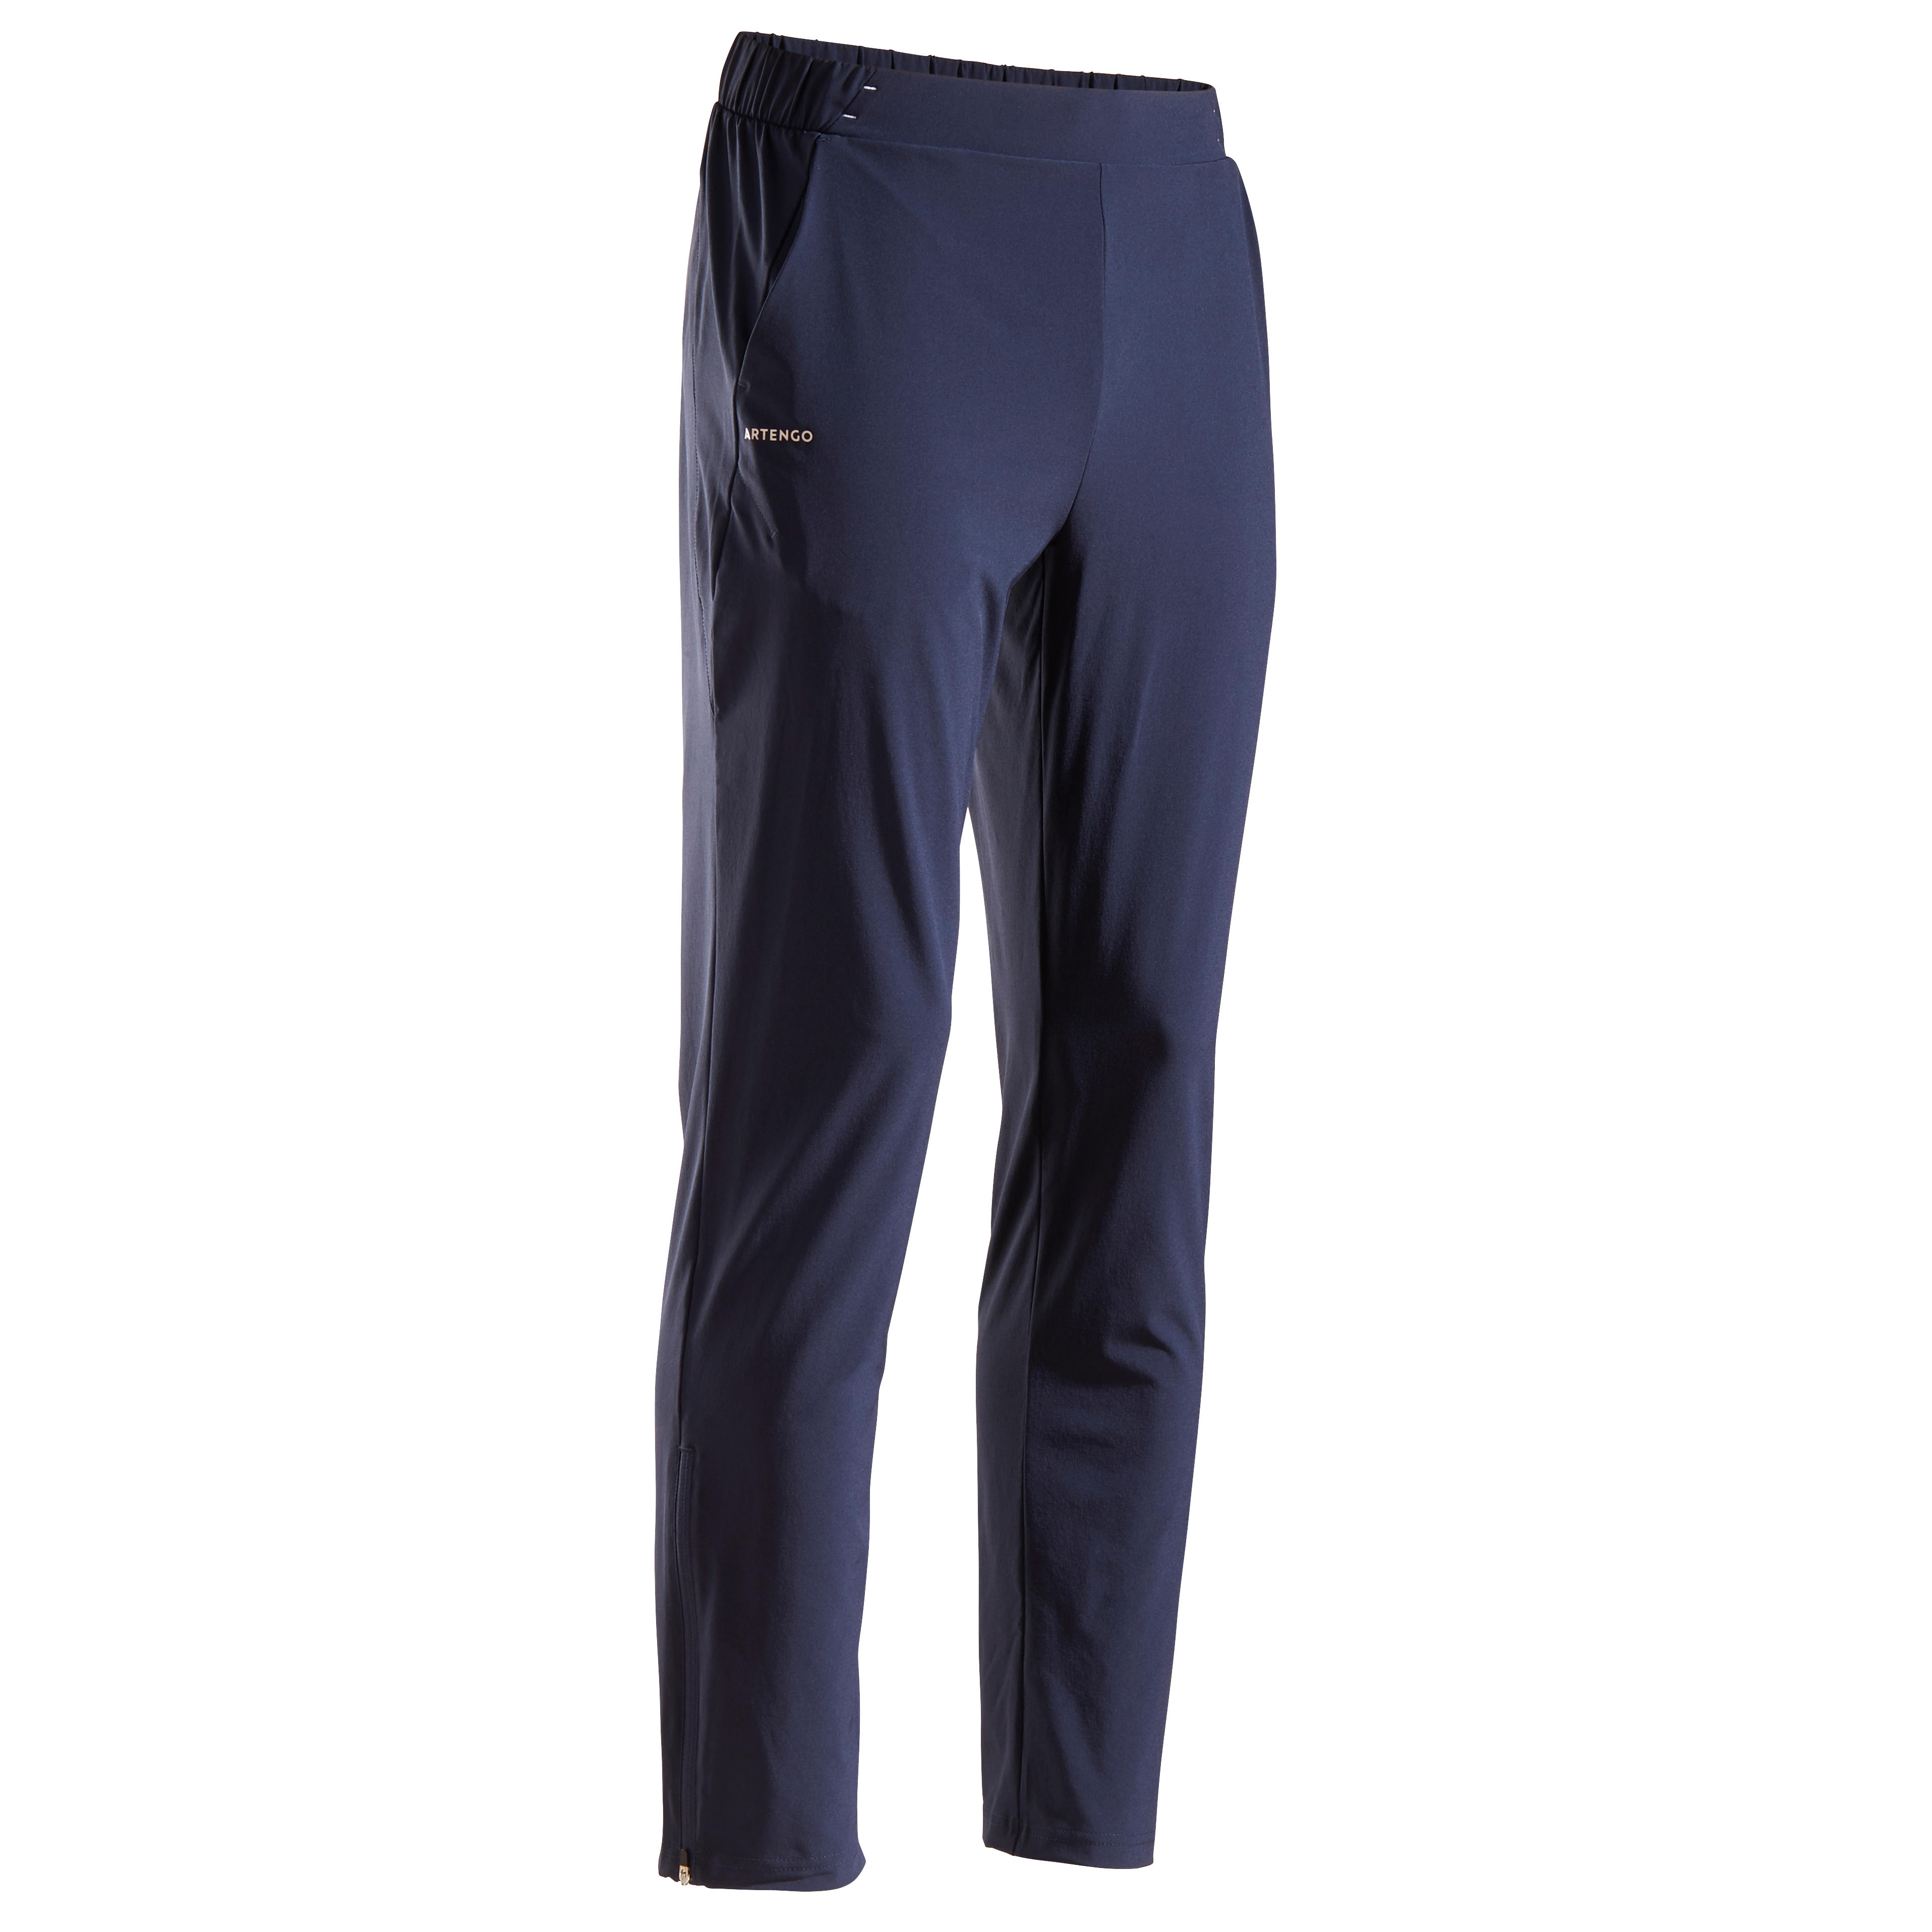 Pantalon Tenis T500 Bărbați imagine